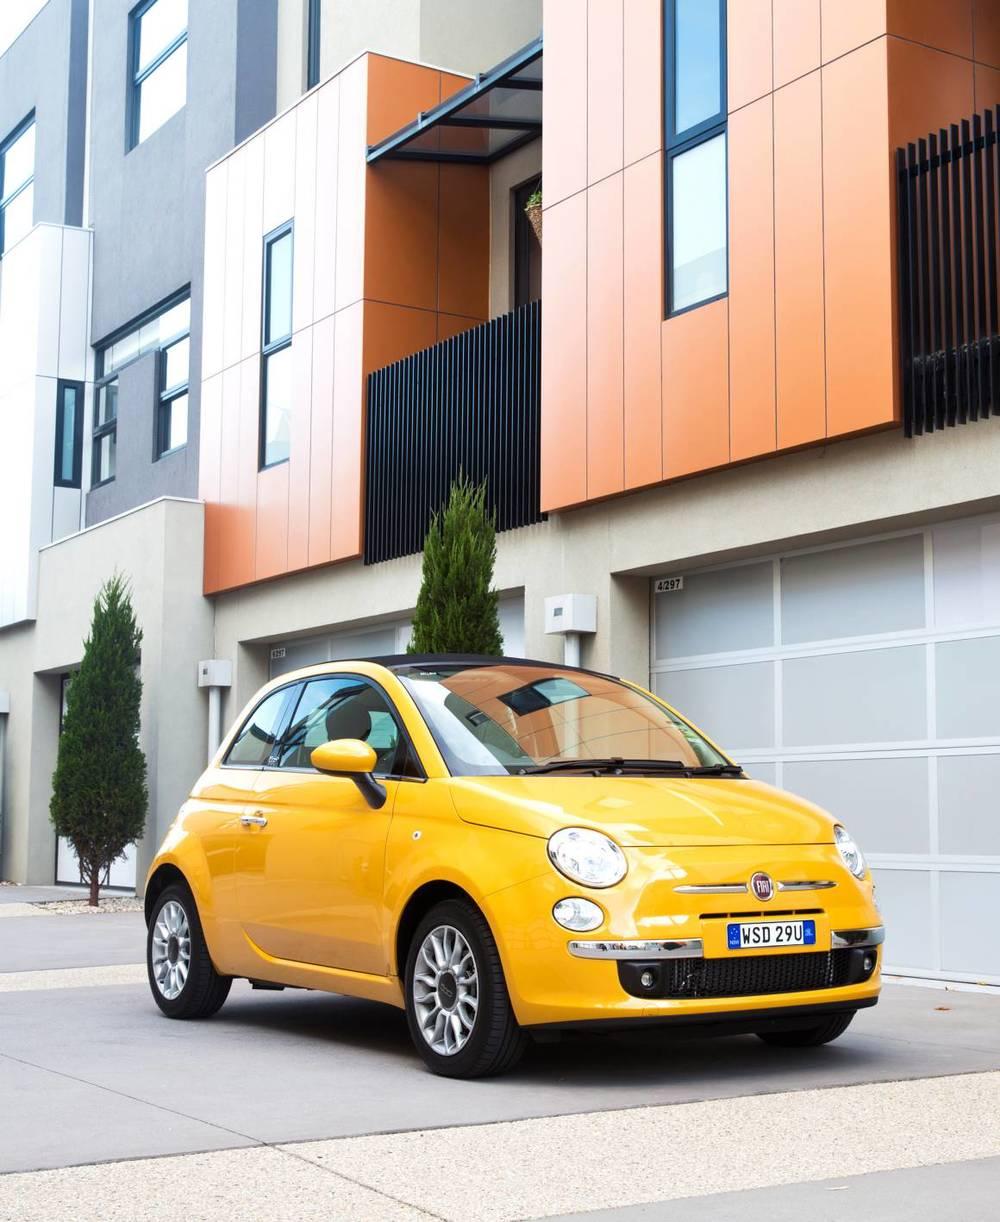 2014 Fiat 500 10.jpg